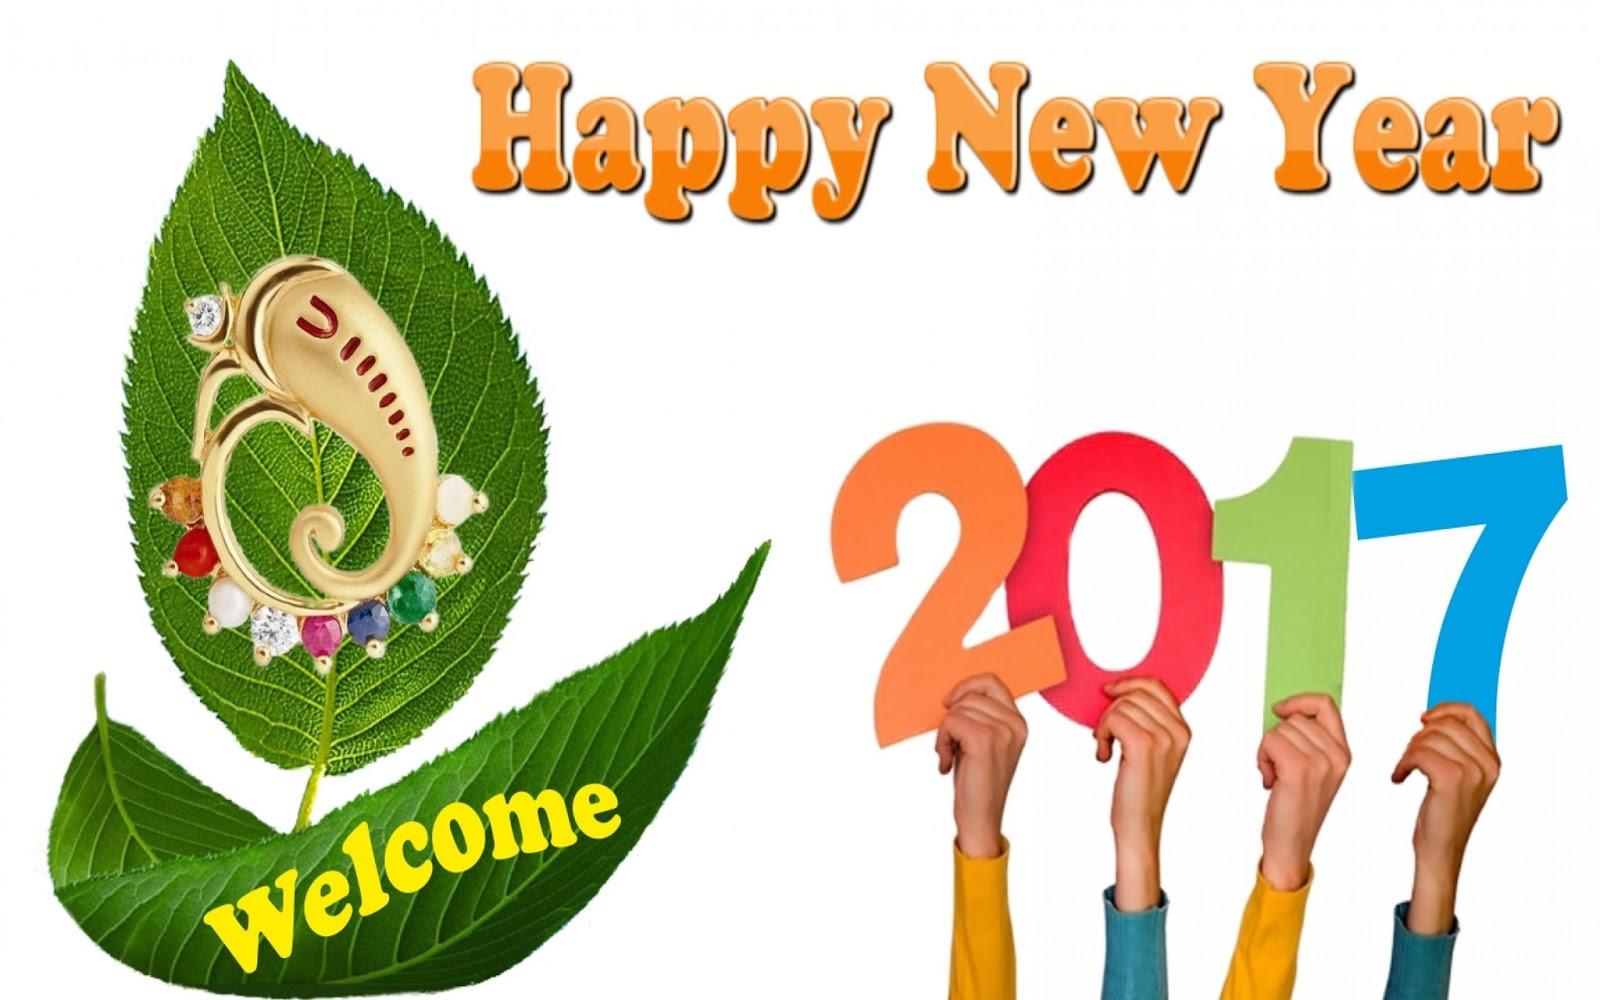 Happy New Year 2017 Happy New Year 2017 New Year Images And Wallpaper